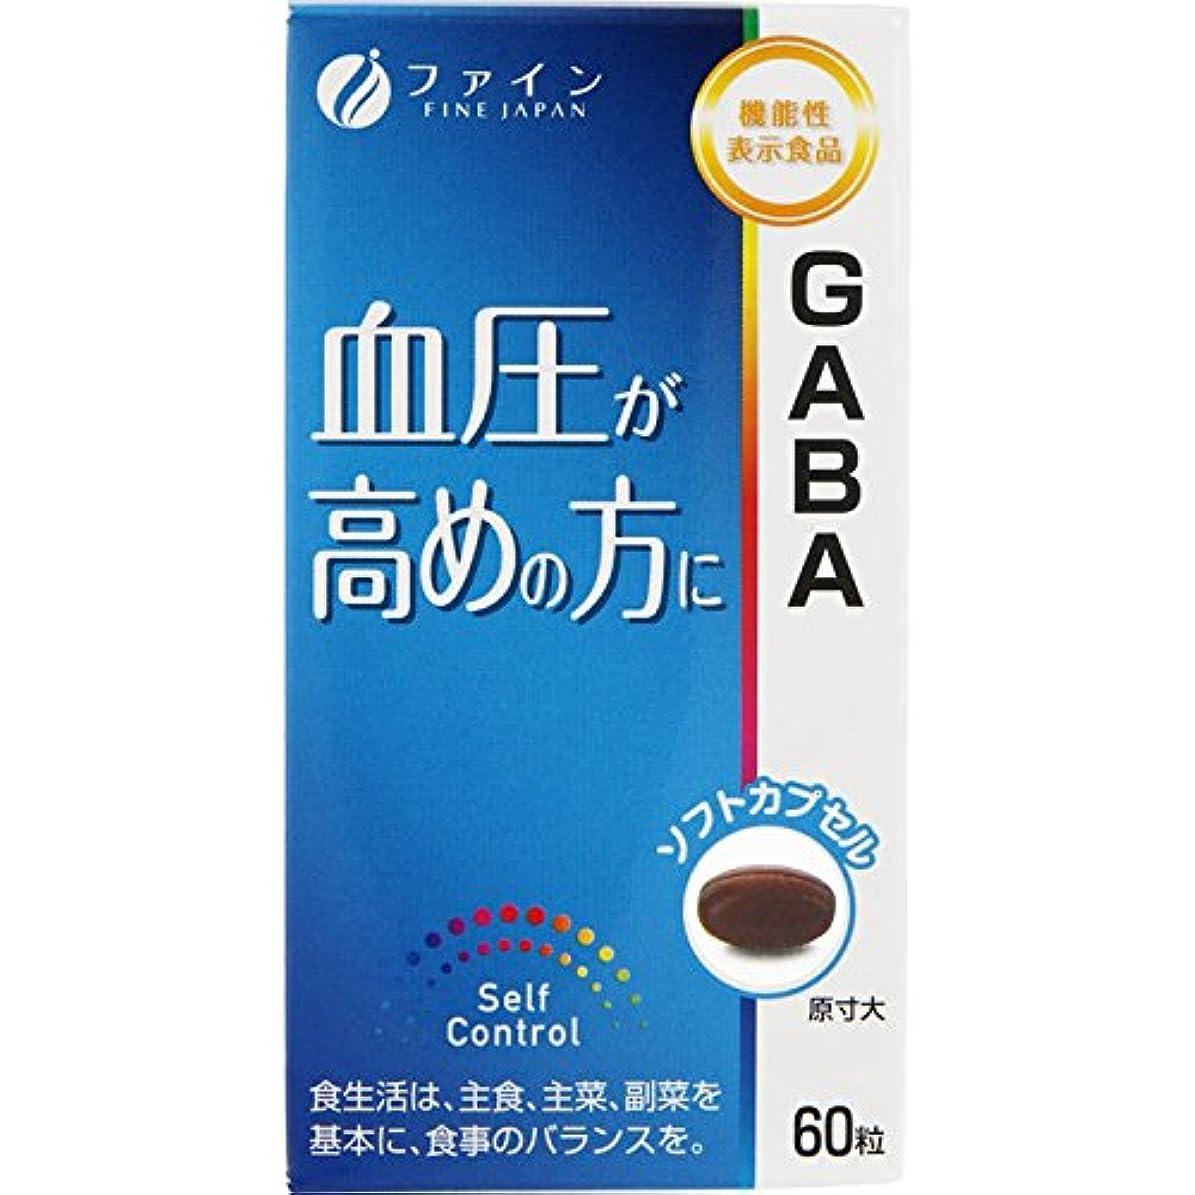 宿る誠実無限大ファイン 機能性表示食品 GABA 27g(450mg×60粒)